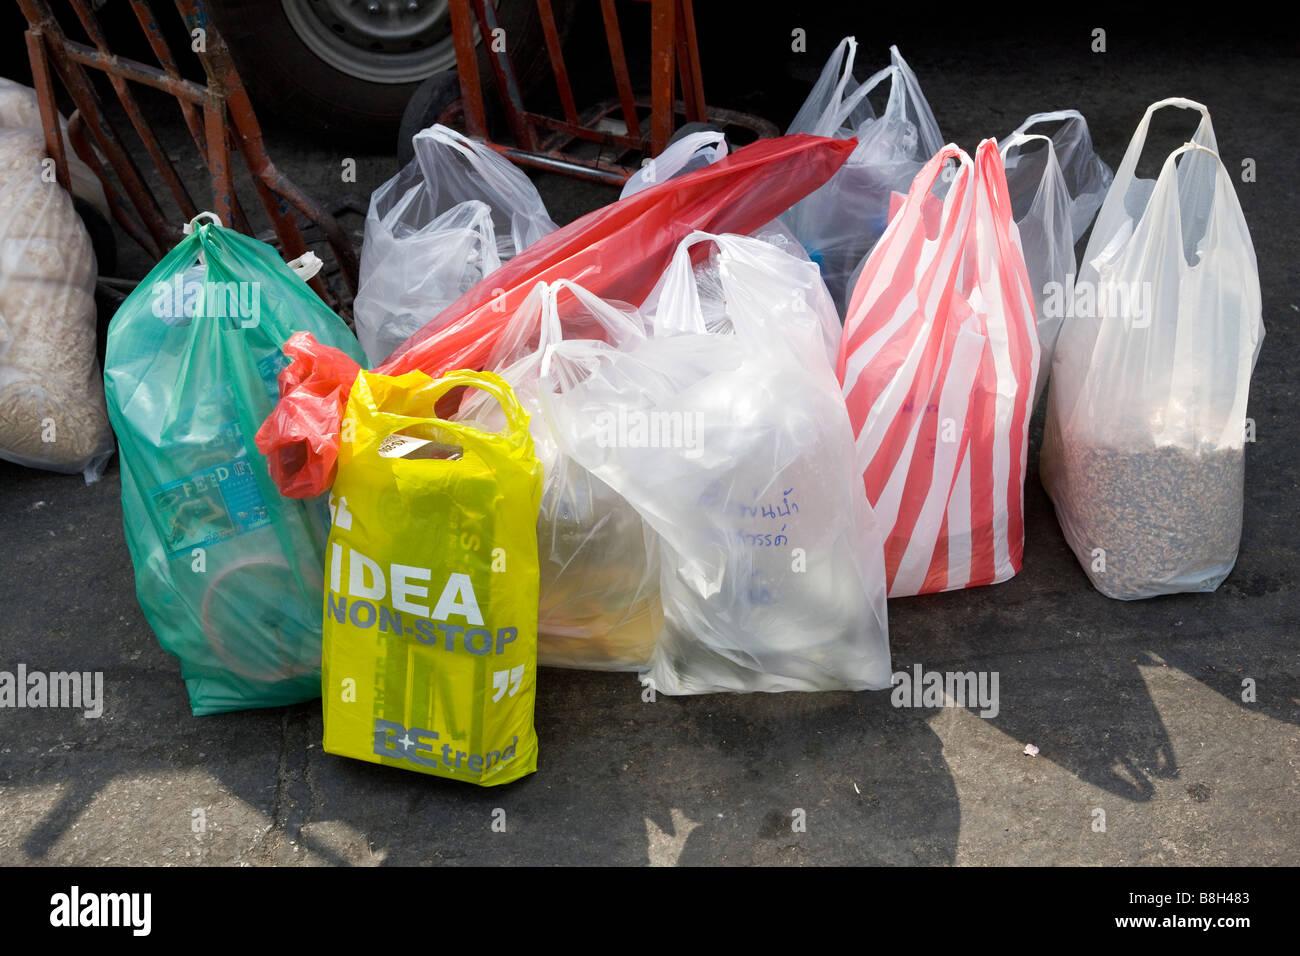 Carrier Bags full of shopping at Chatuchak Weekend Market Bangkok - Stock Image